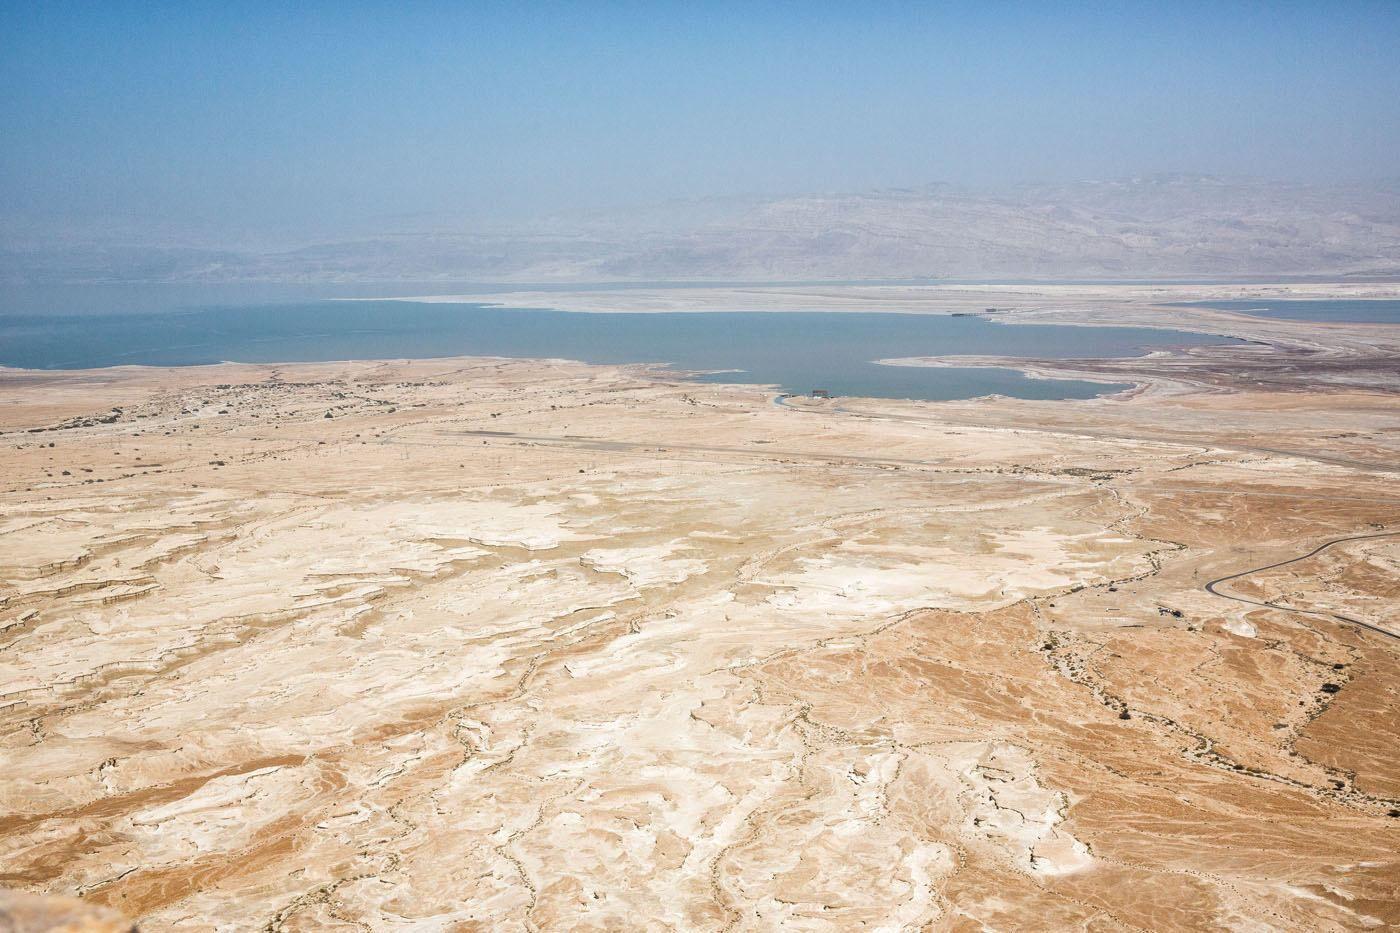 Dead Sea View from Masada